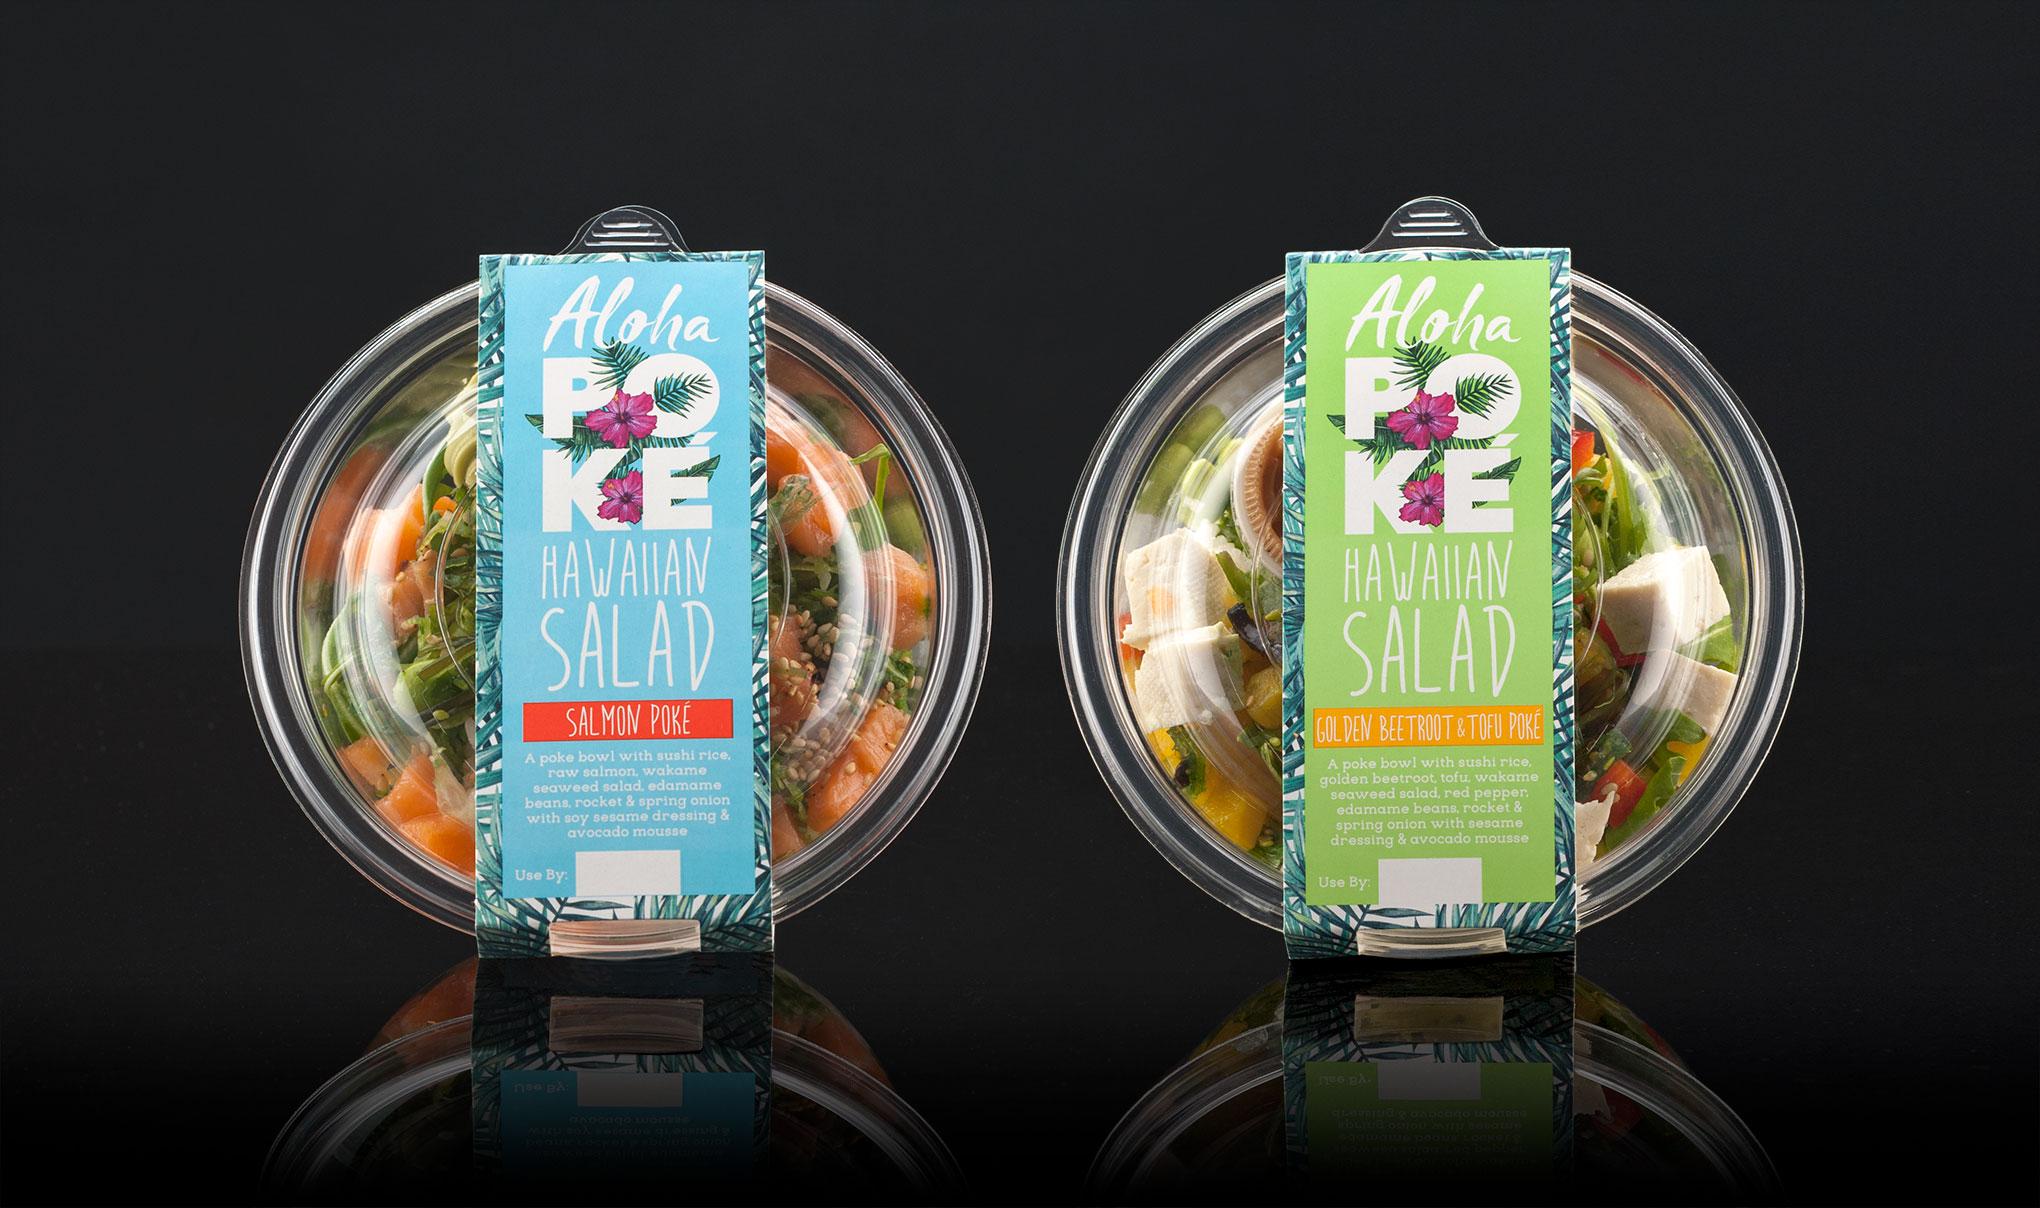 Aloha Poke Packaging Design by Creative Agency - Flipflop Design